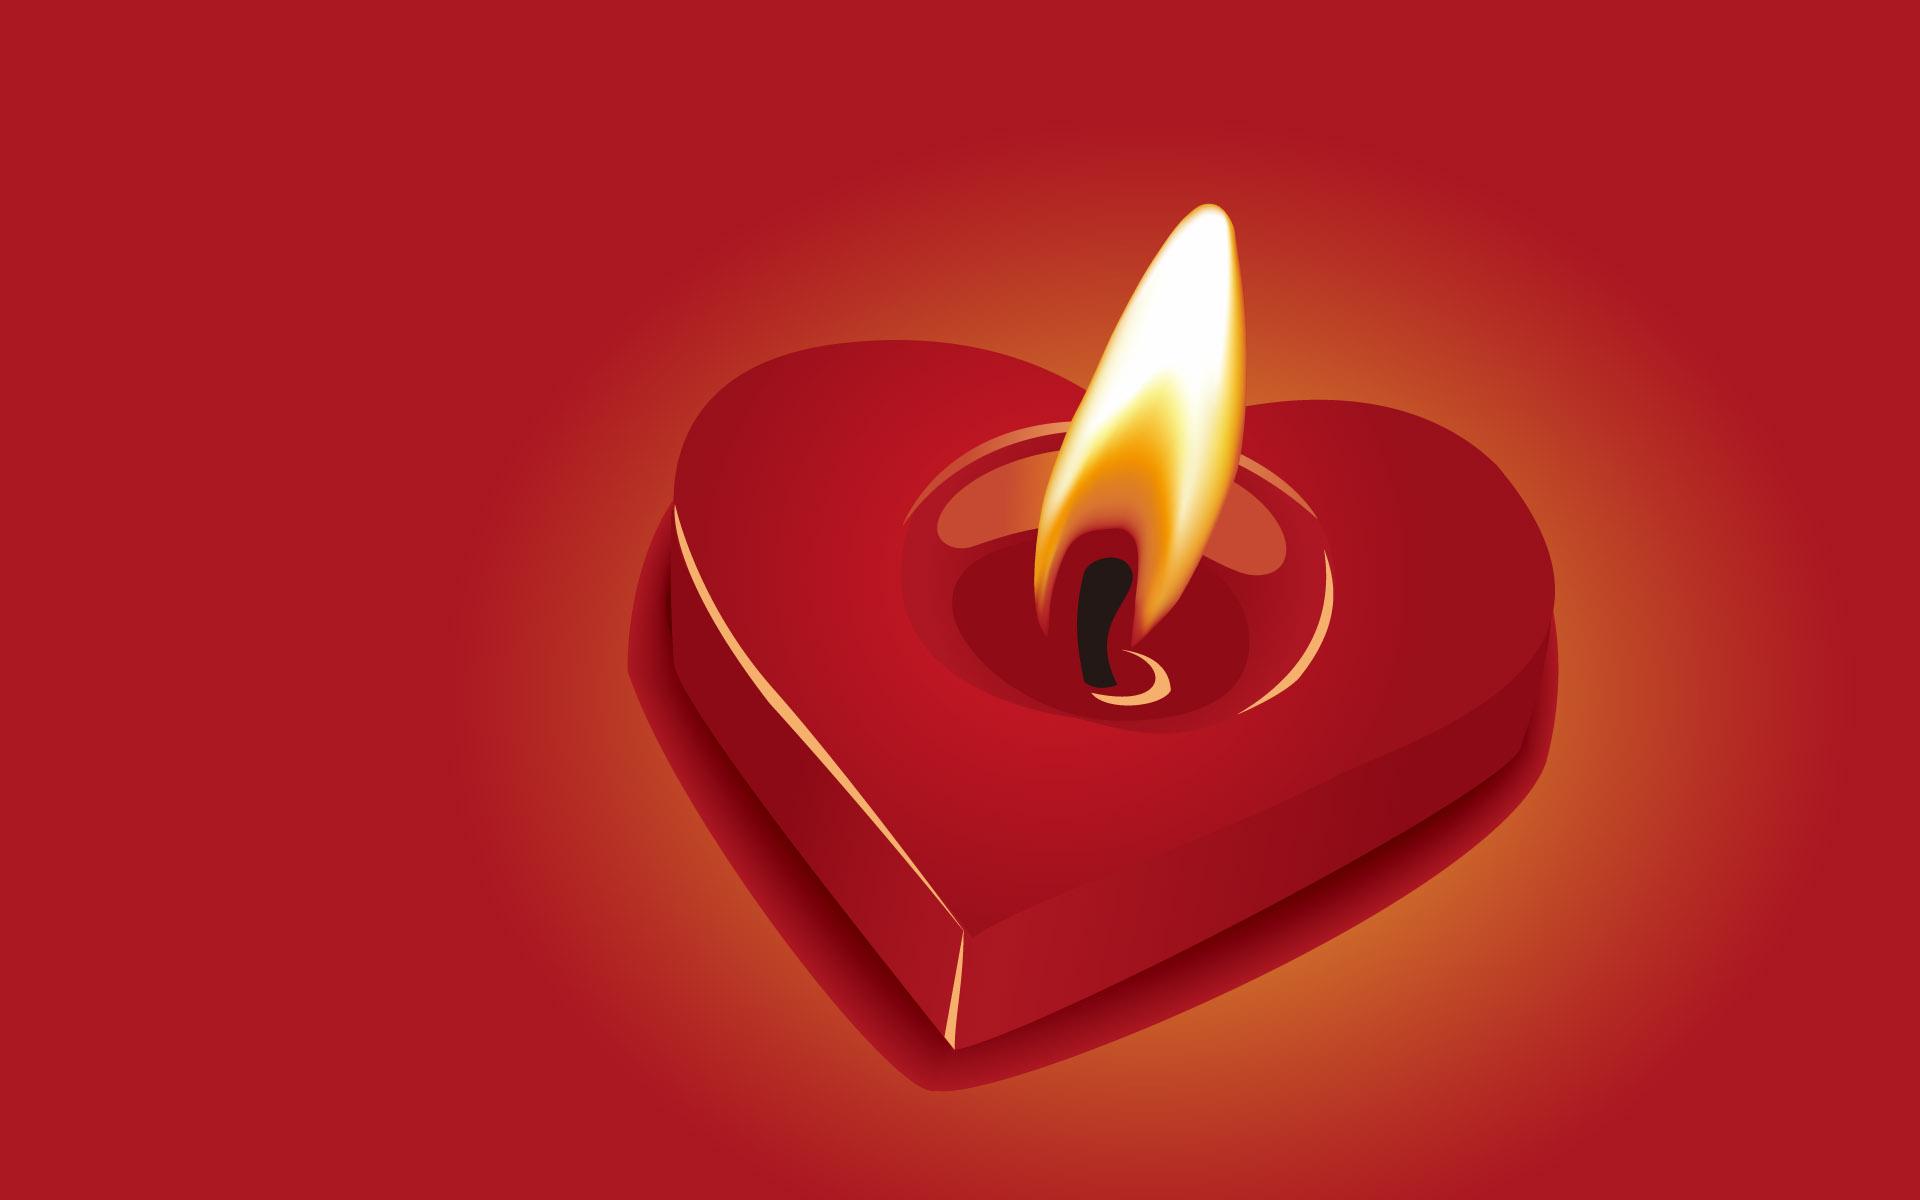 http://www.zastavki.com/pictures/1920x1200/2008/Love_Heart_-_candle_011183_.jpg